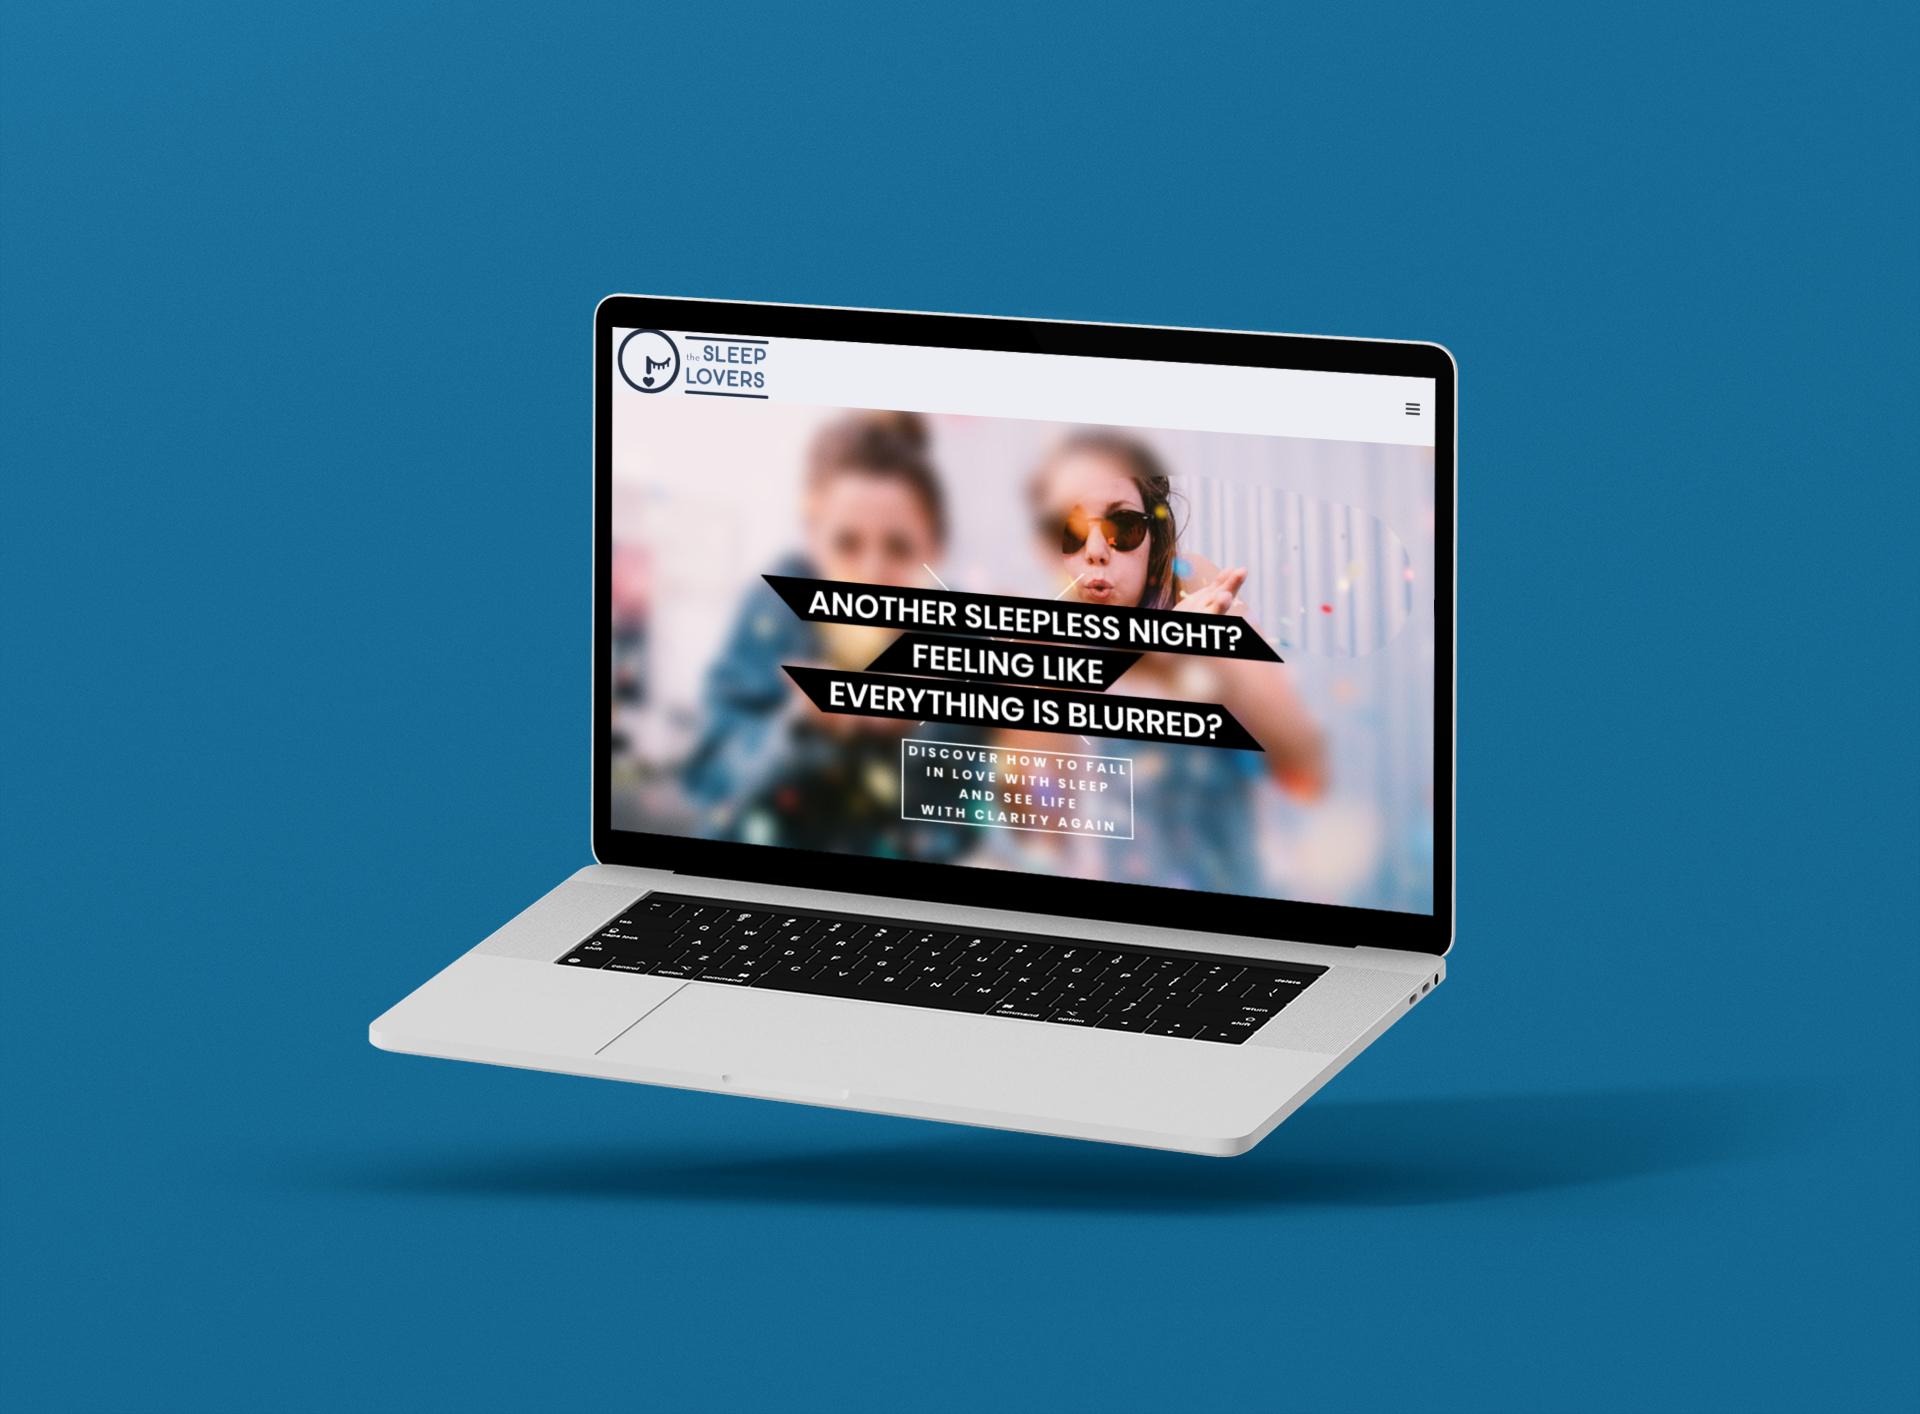 minimalistic-macbook-pro-mockup-floating-against-a-solid-color-backdrop-63-el